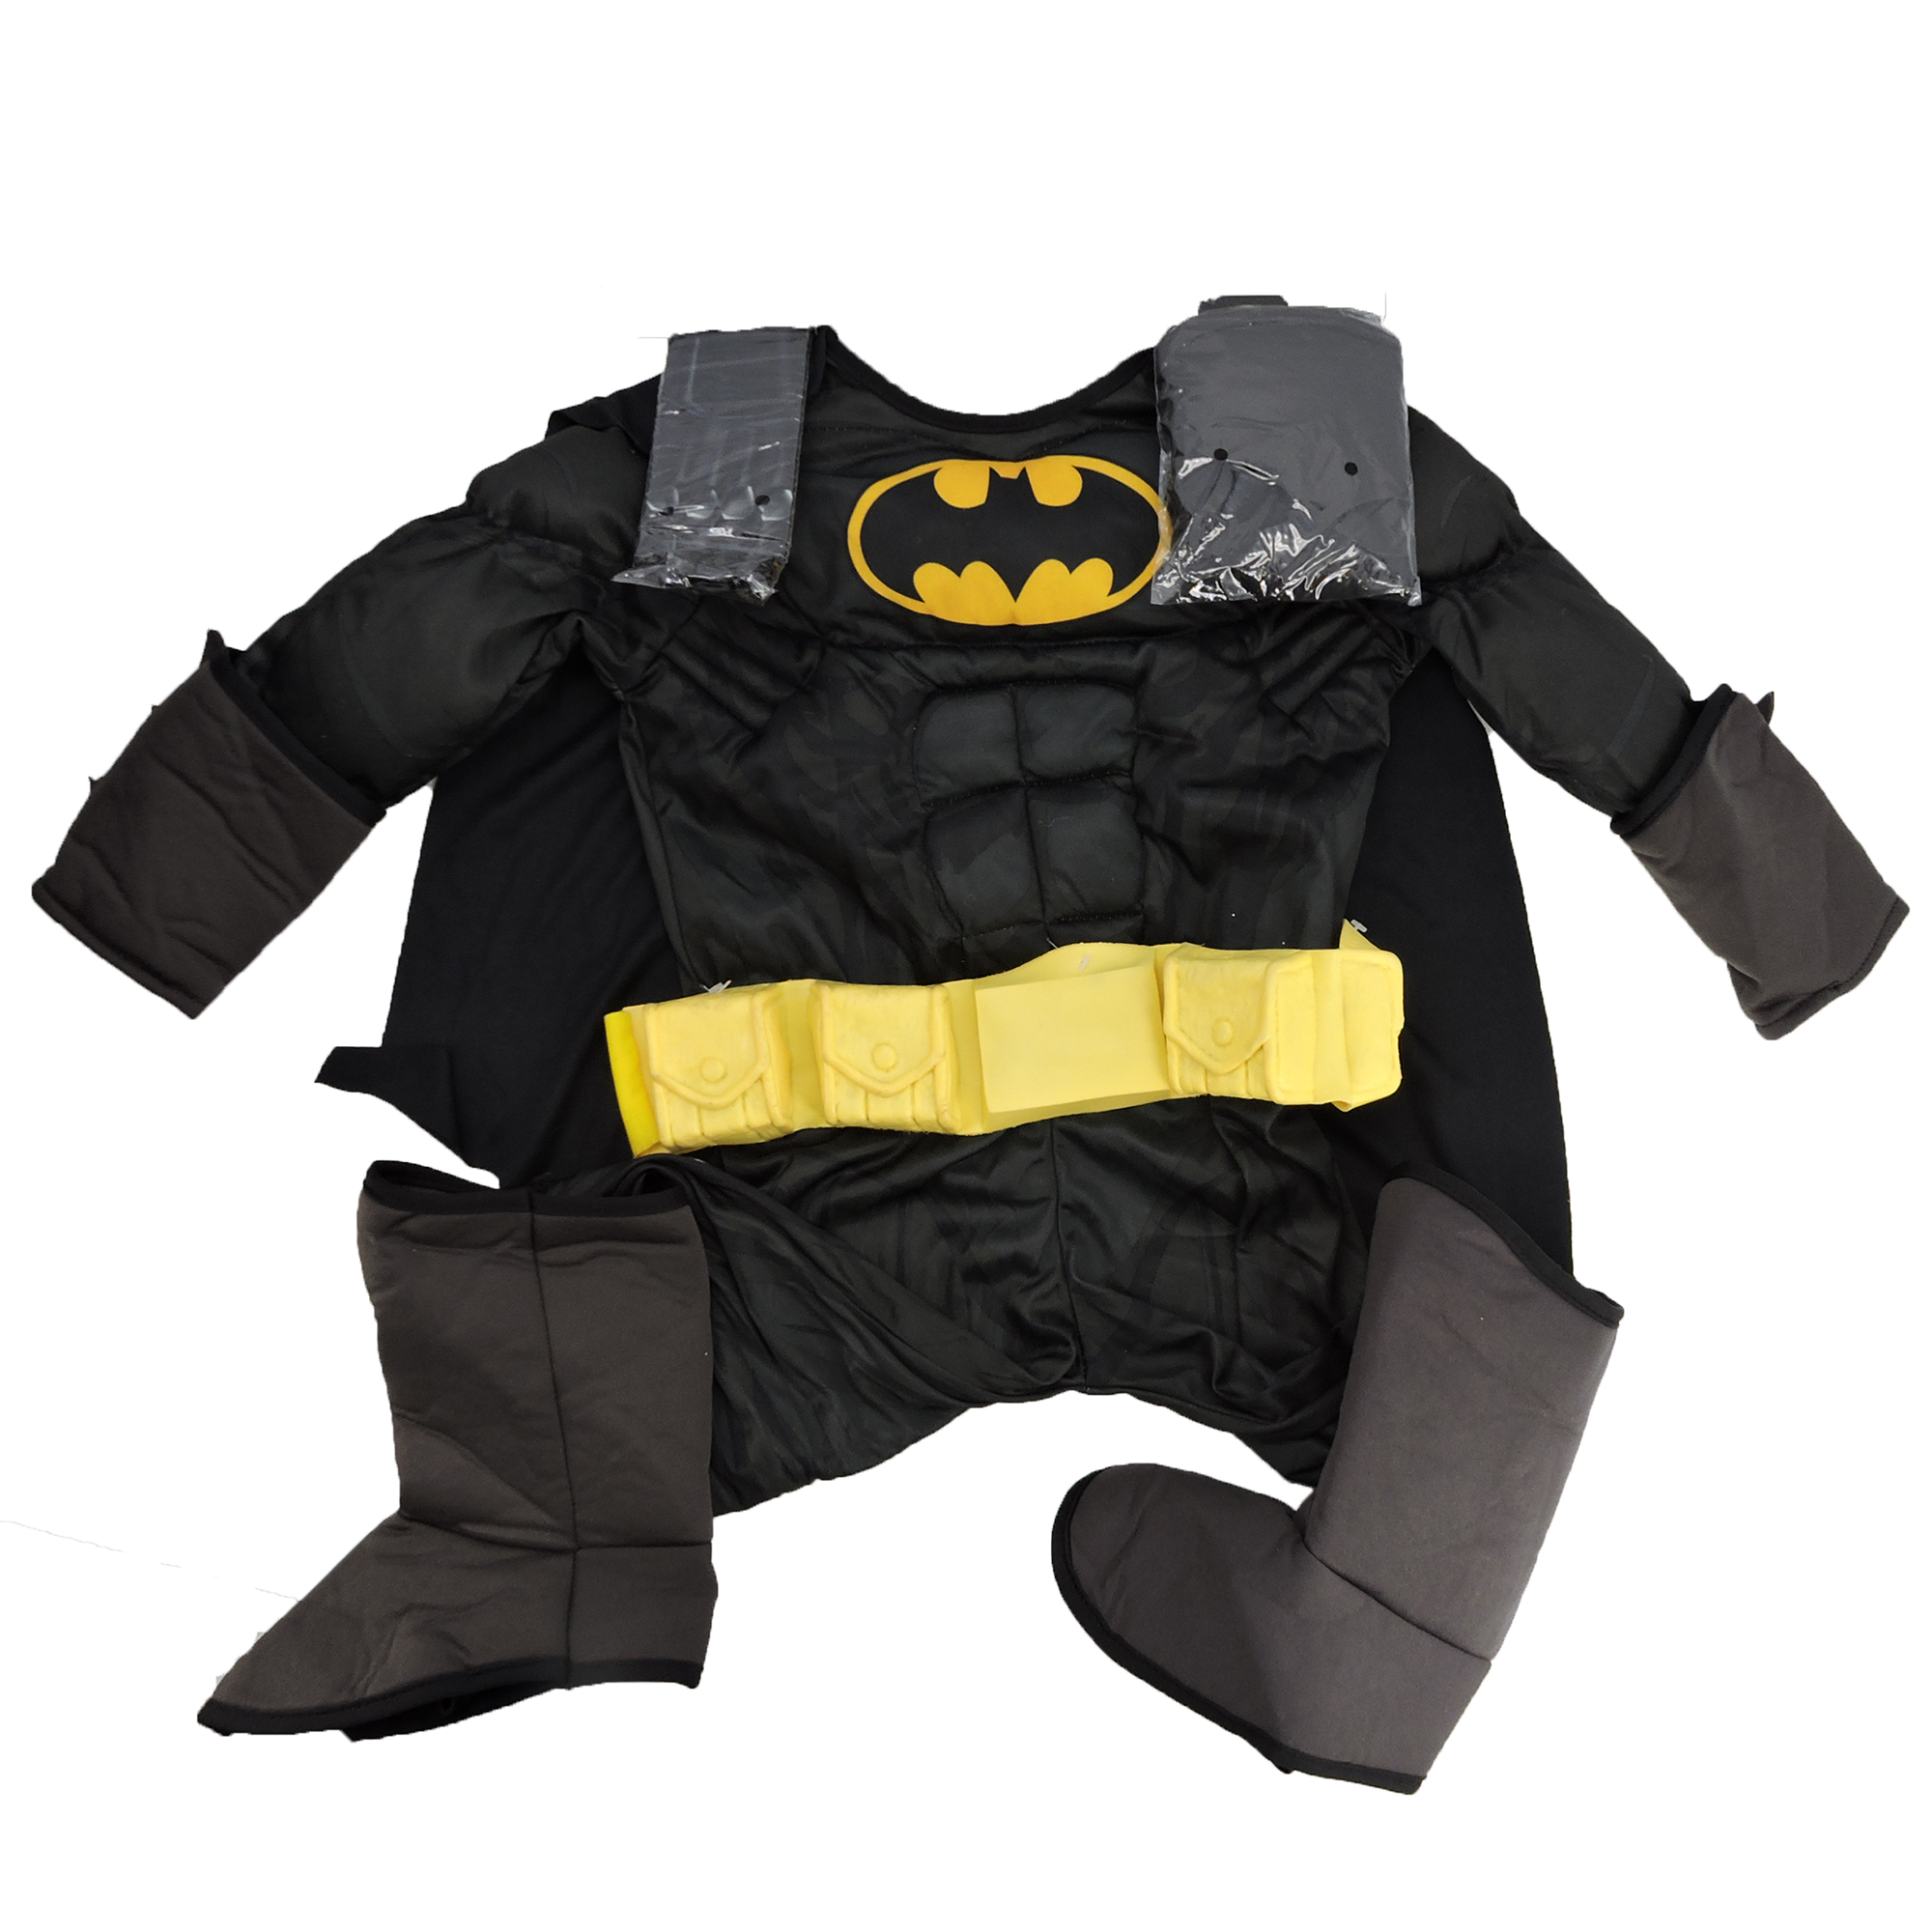 Batman Child Costume Toddler